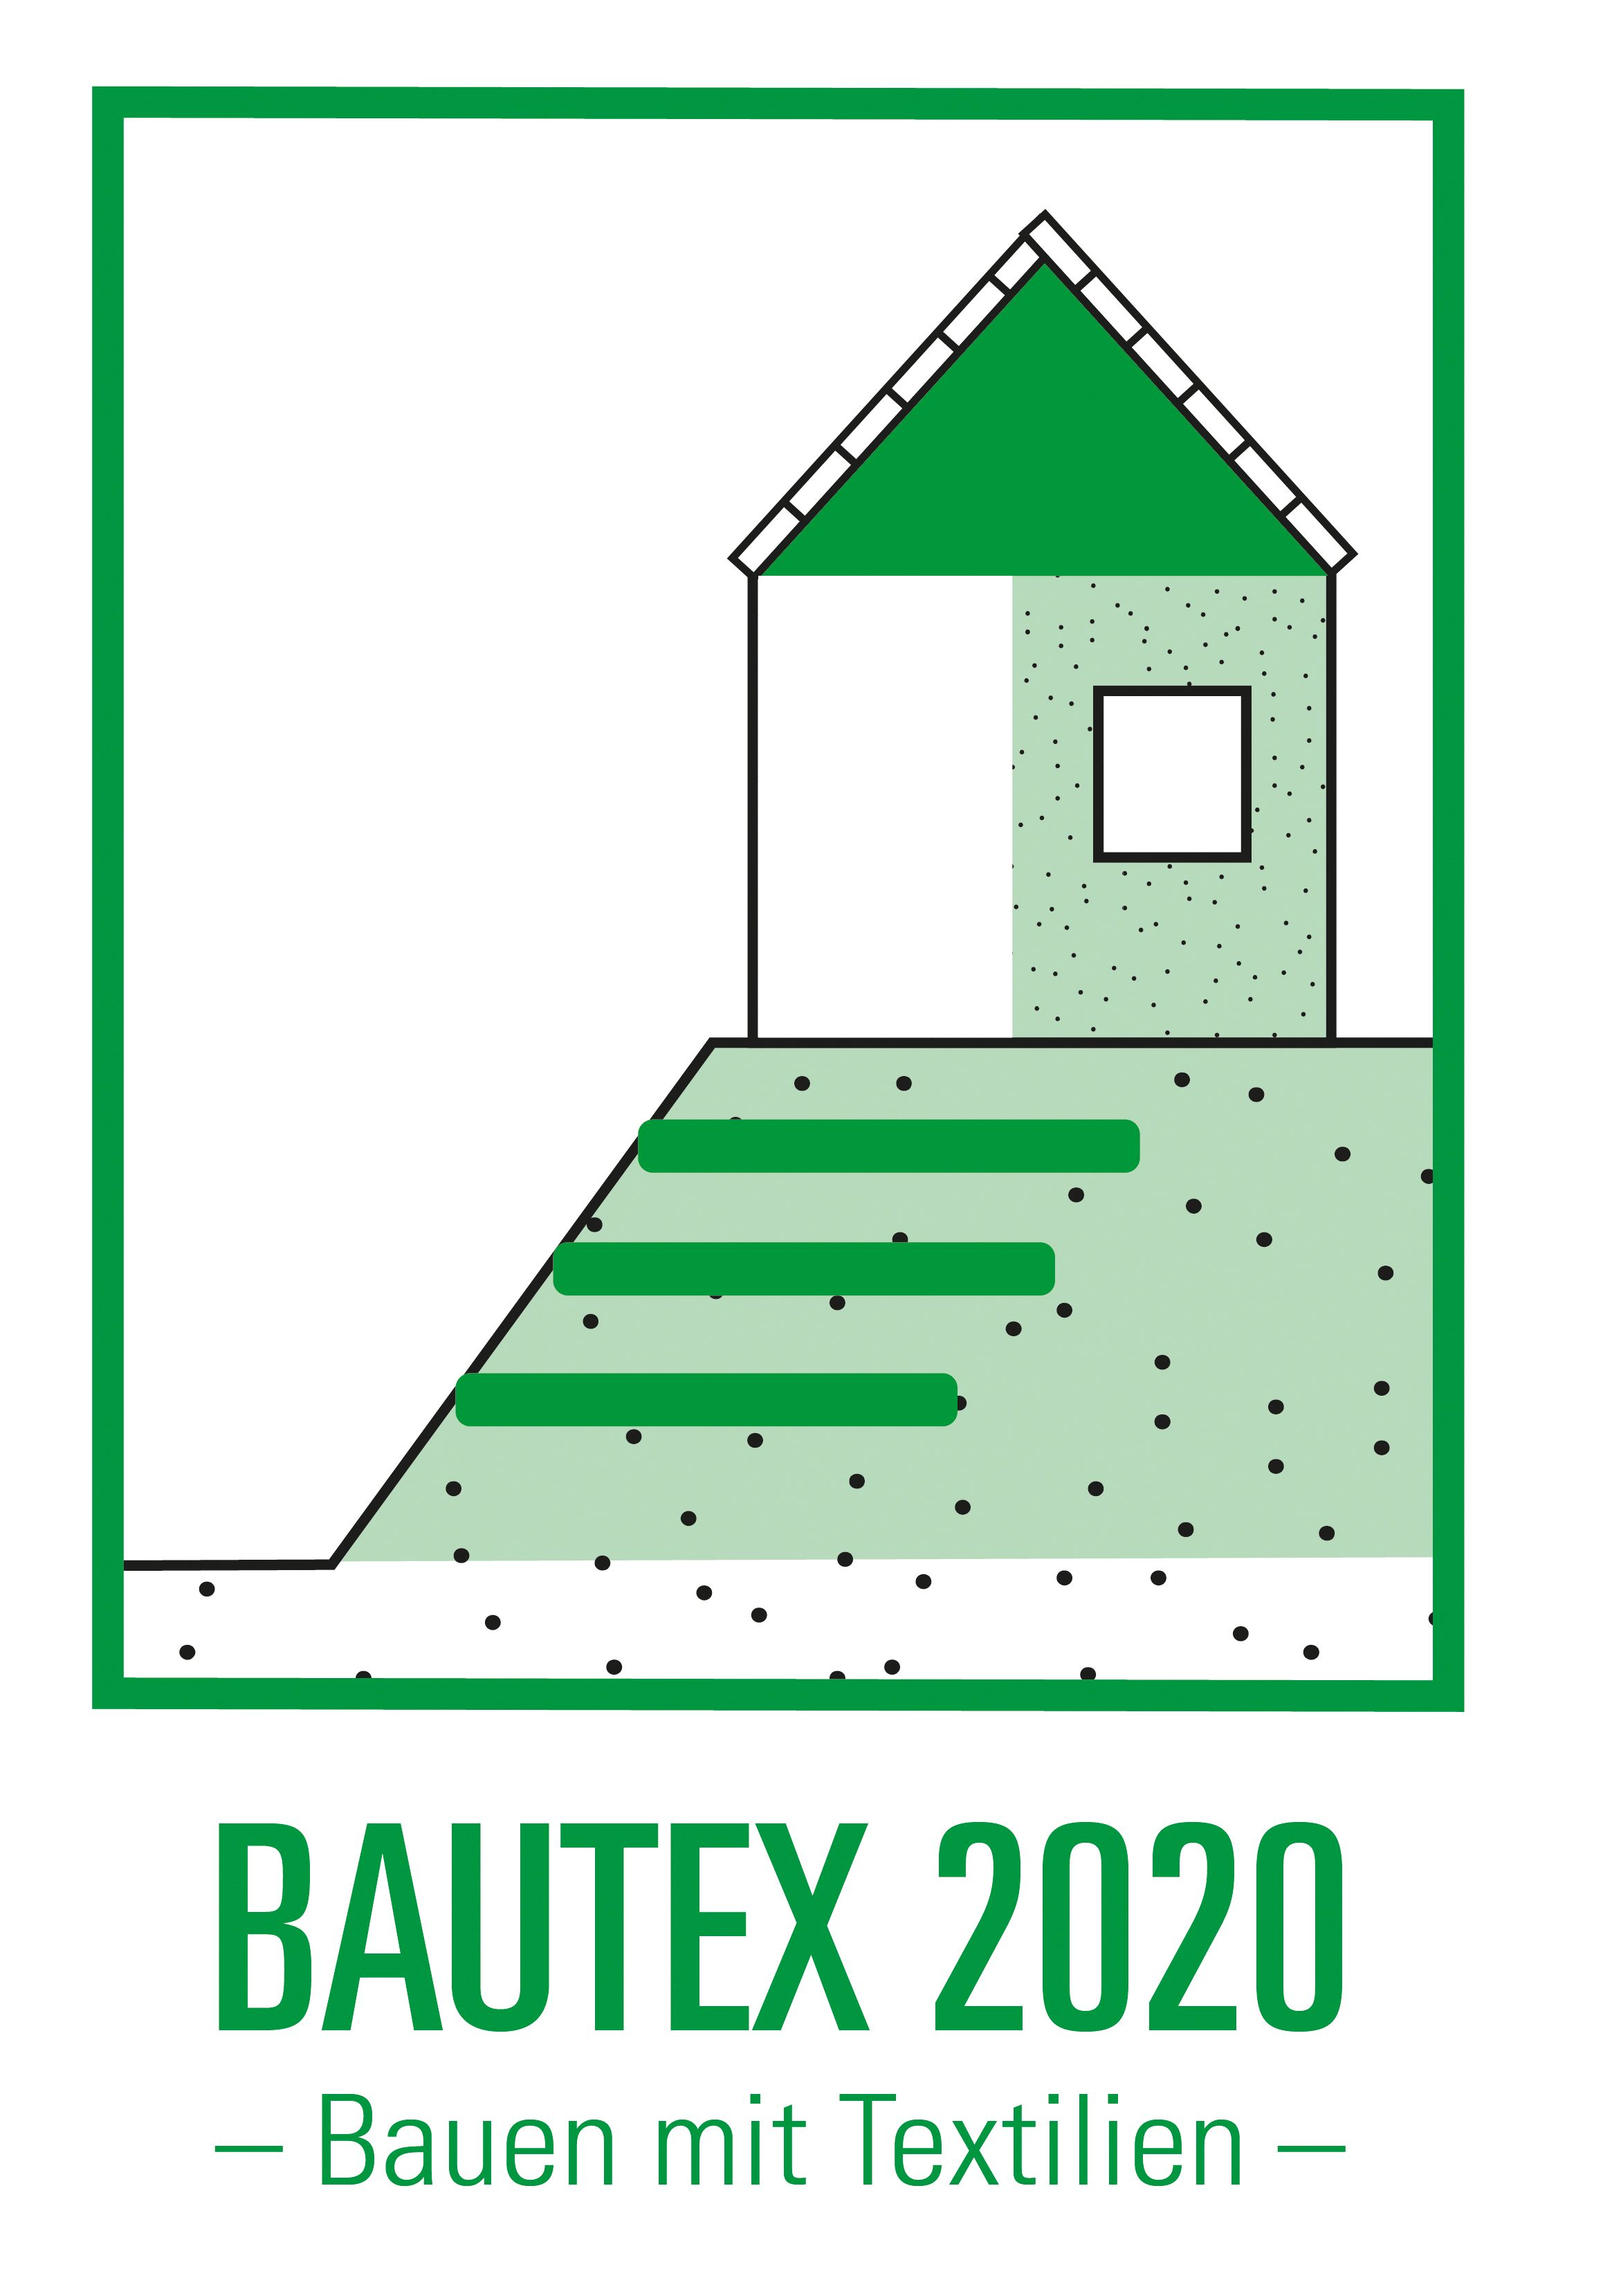 Logo BAUTEX 2020